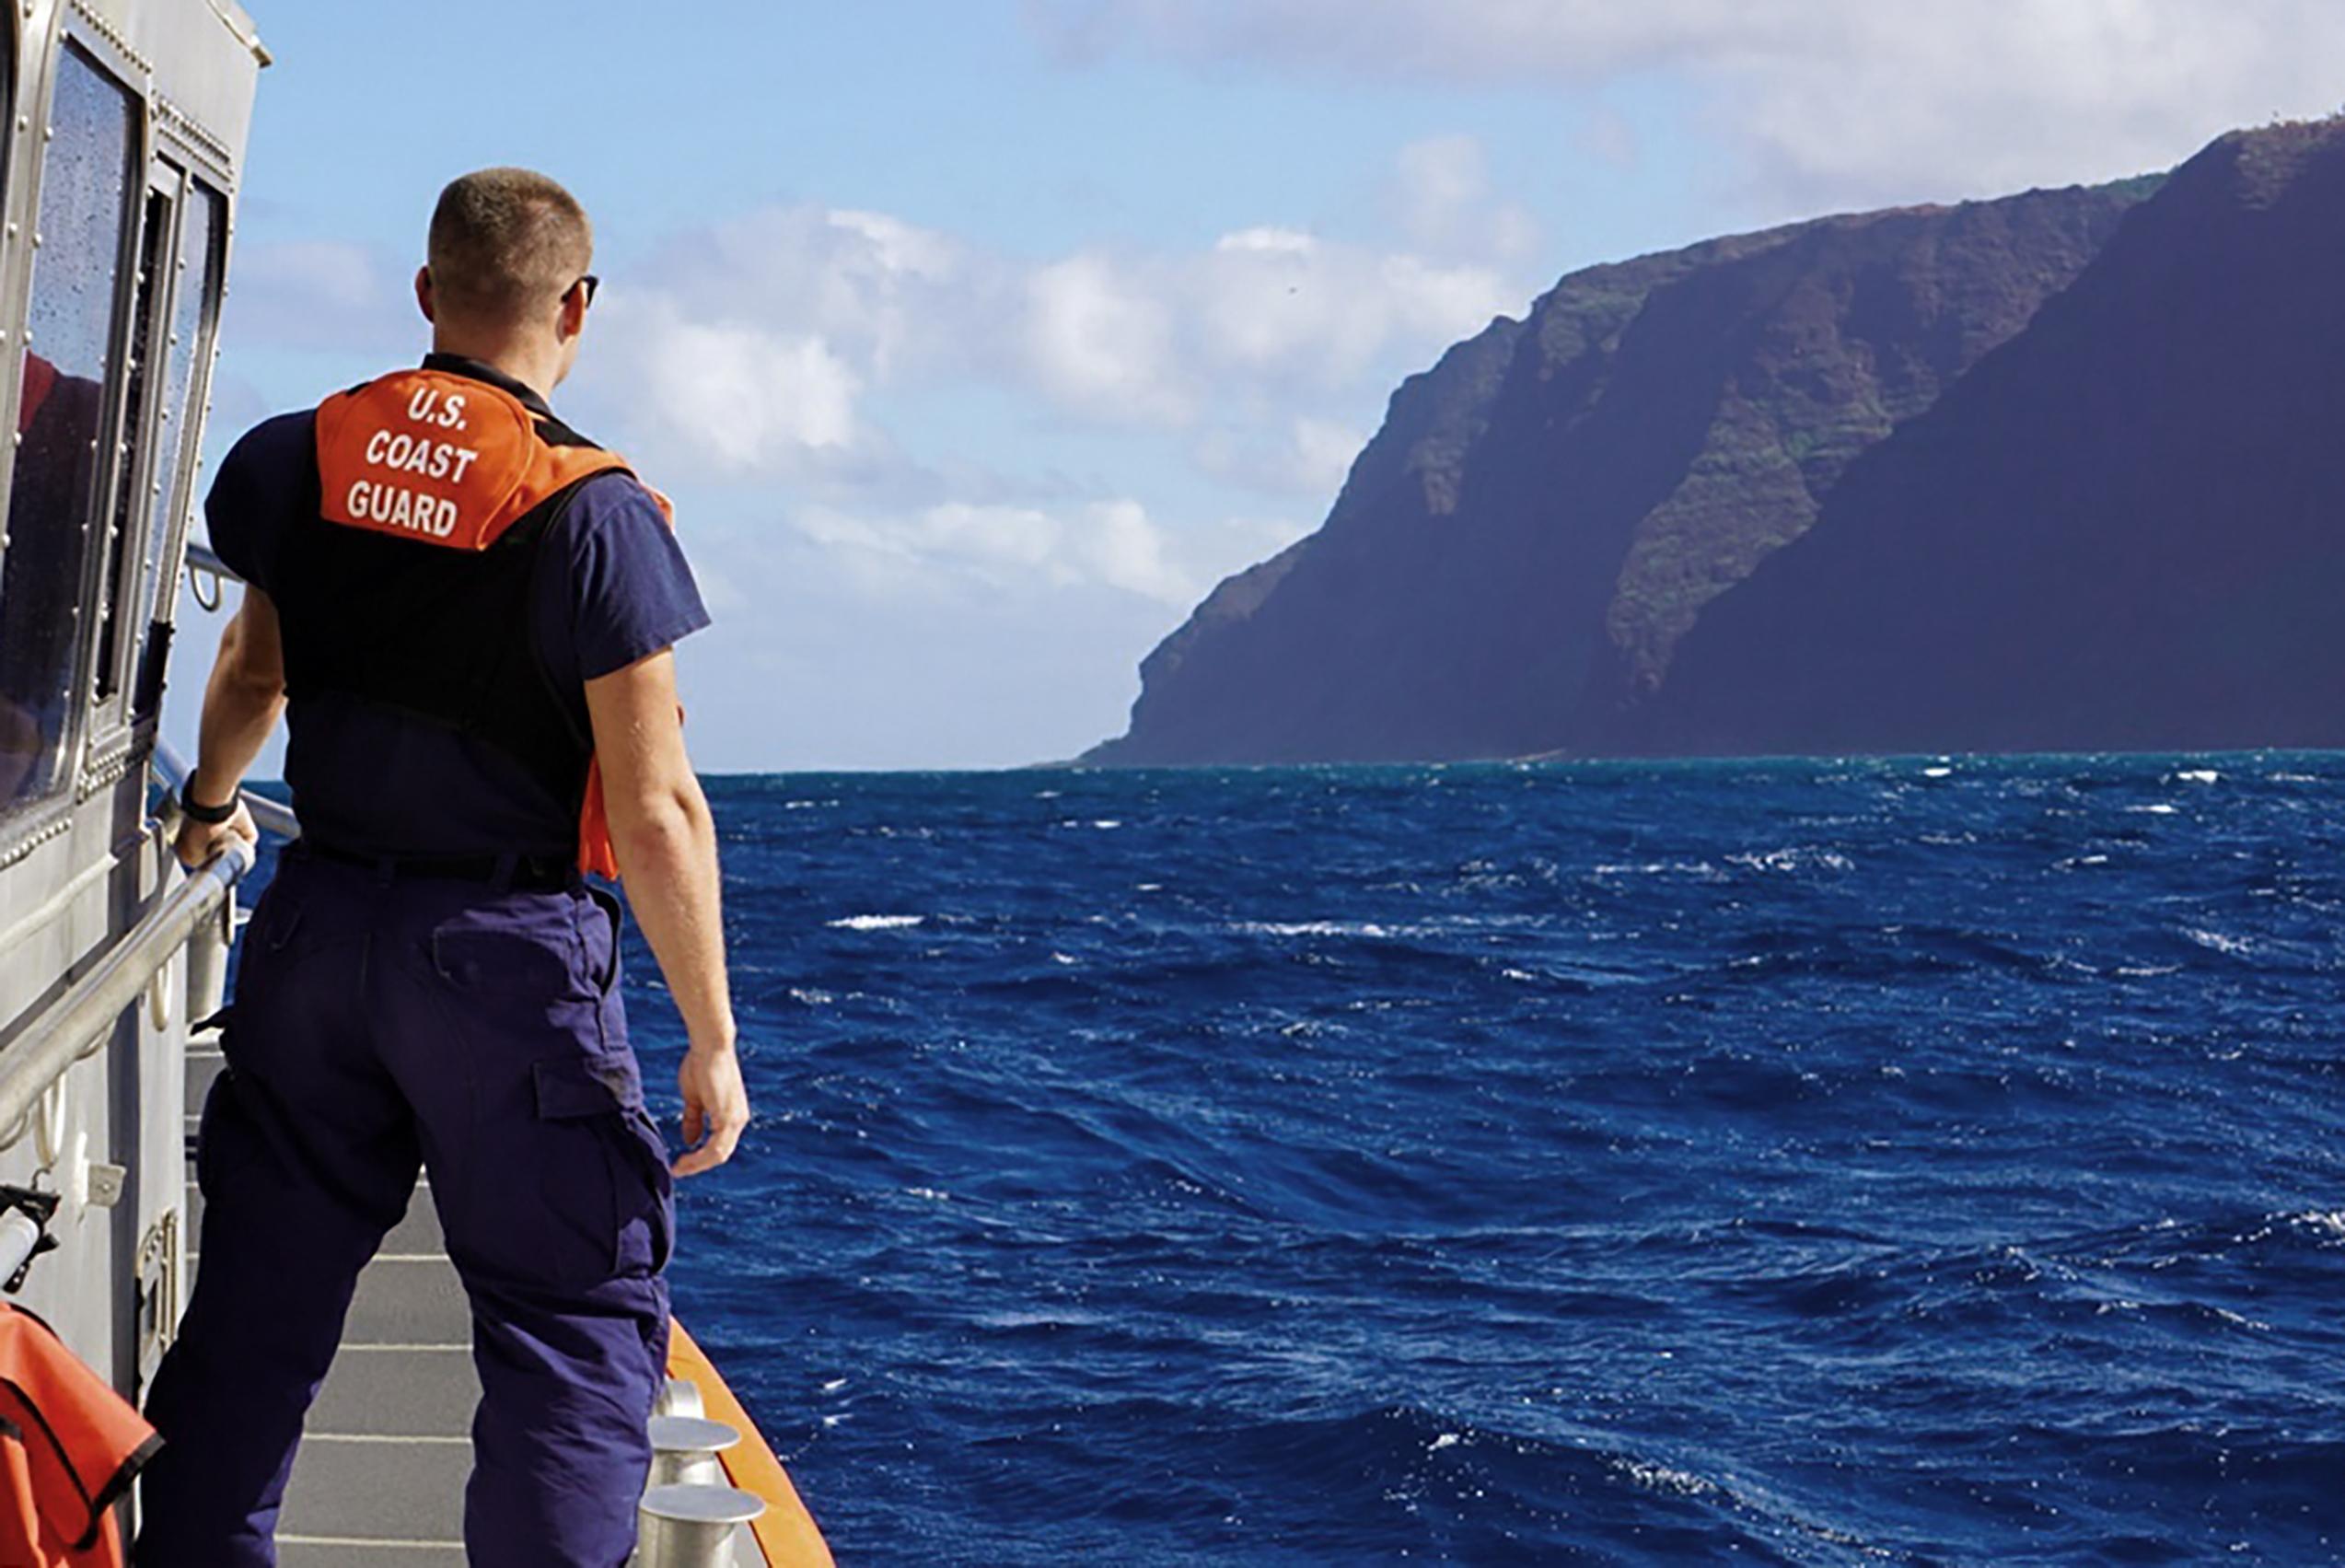 Hawaii crash update: Tour copter hit ridge, then fell